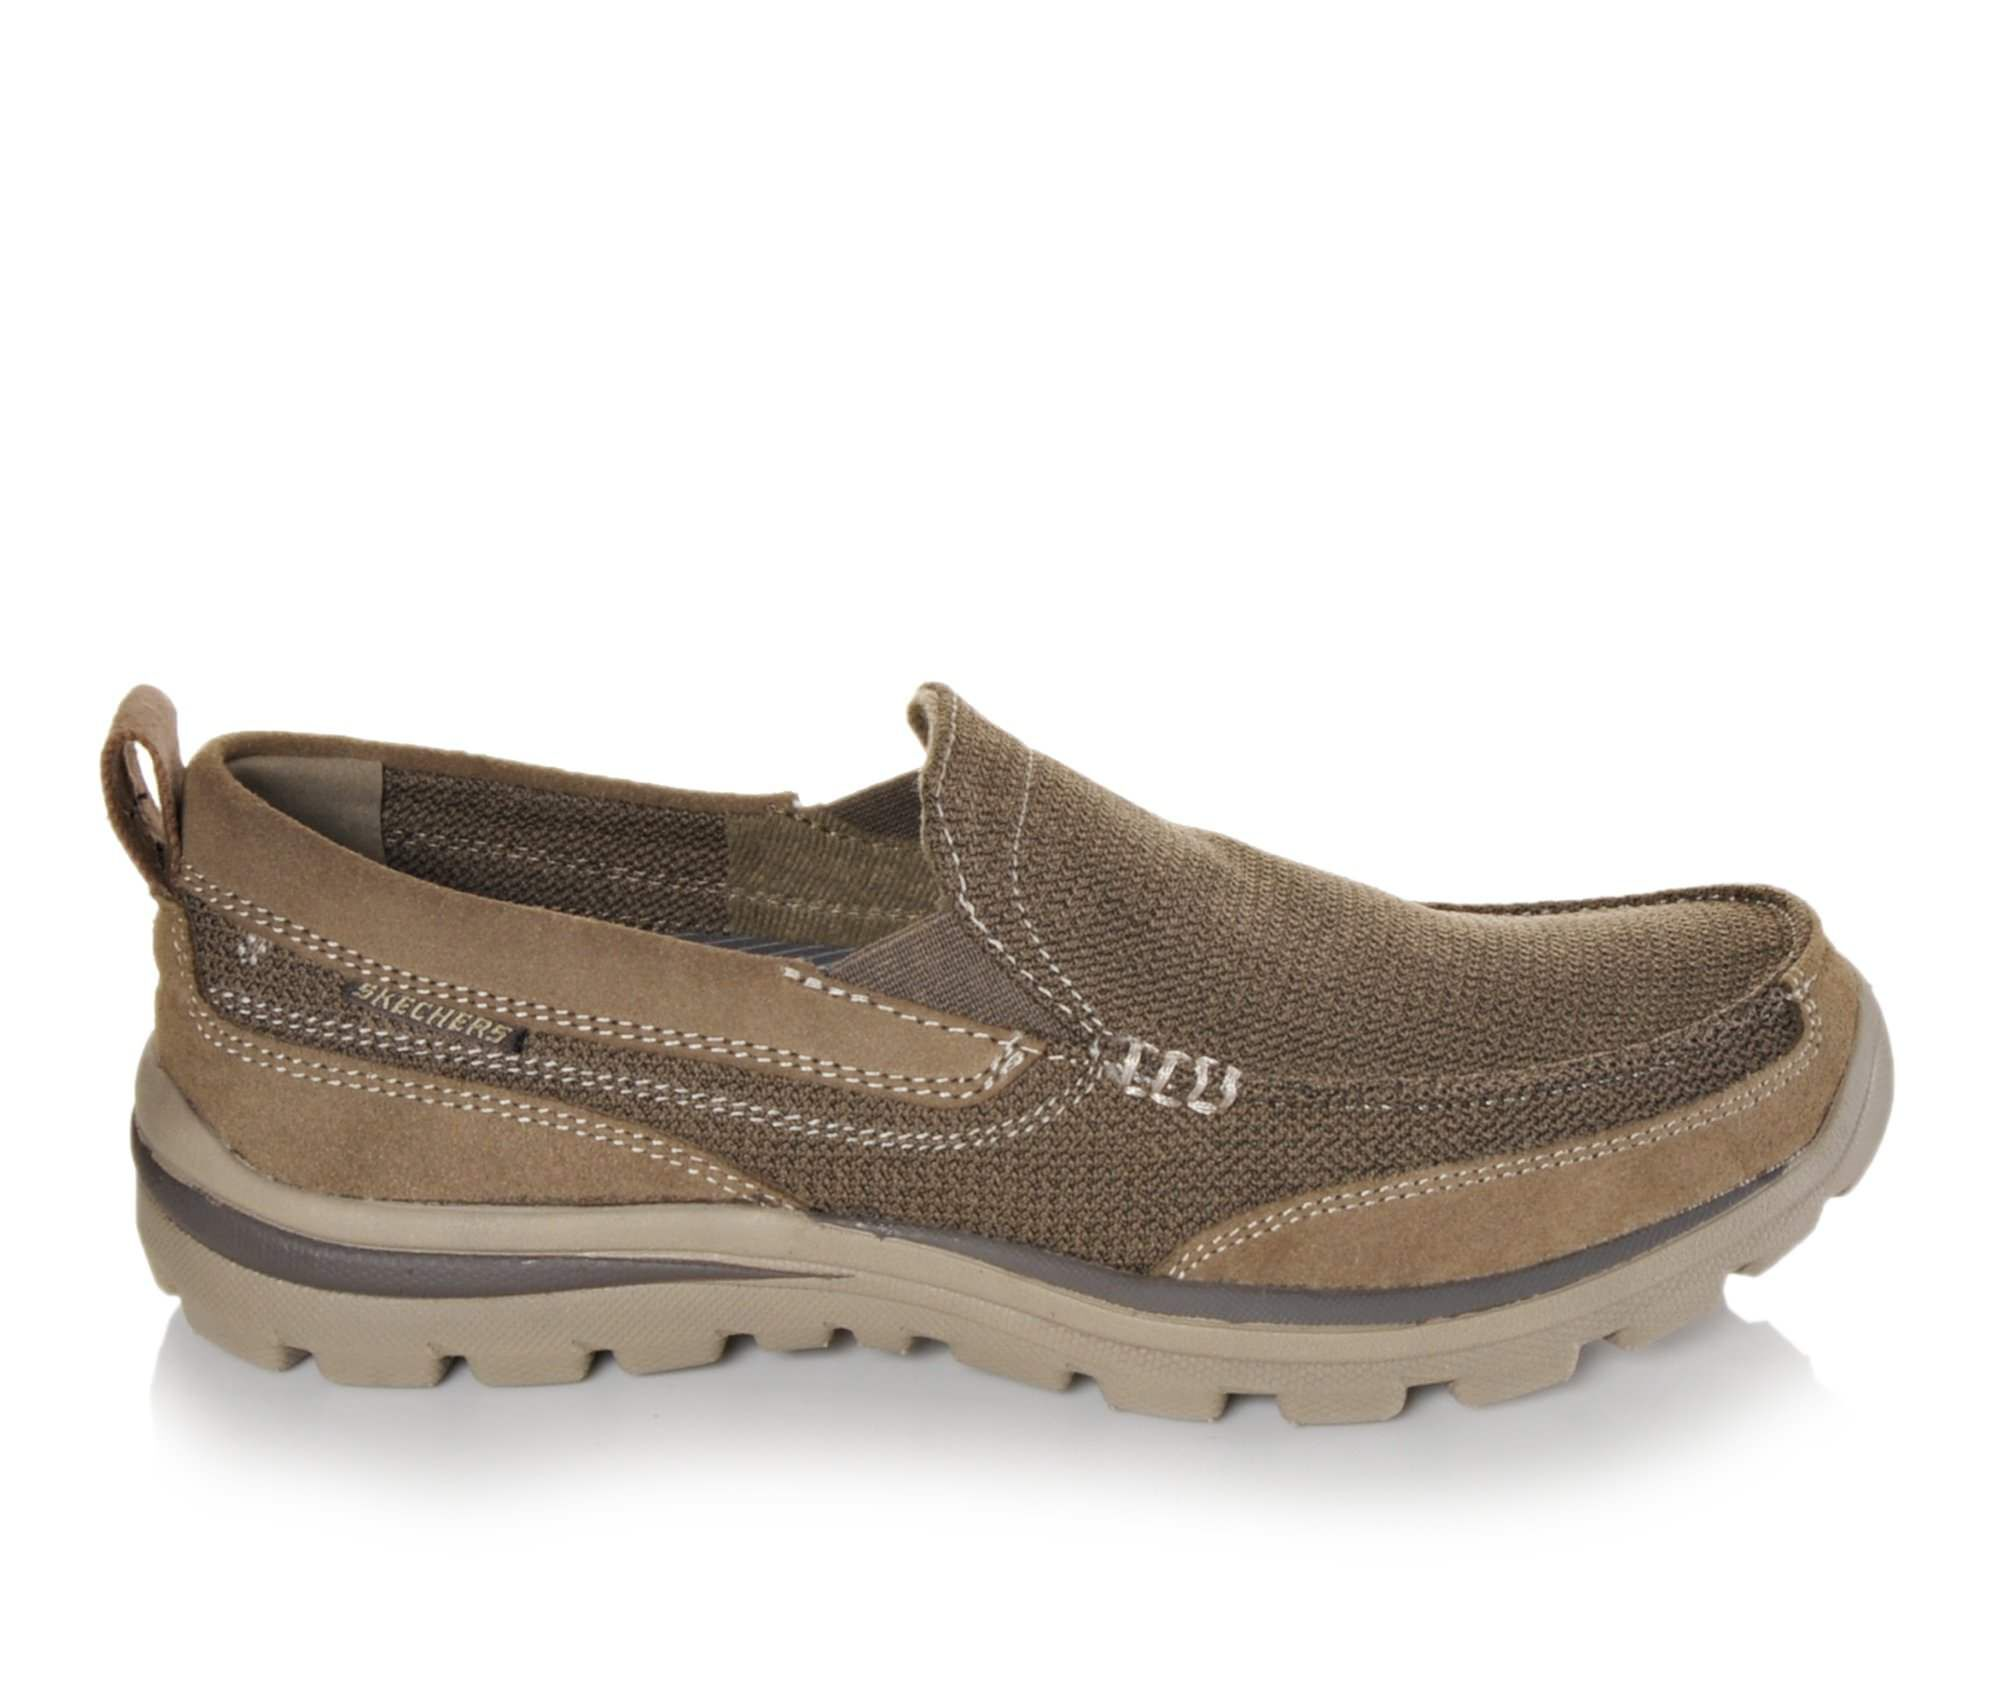 Men's Skechers Milford 64365 Casual